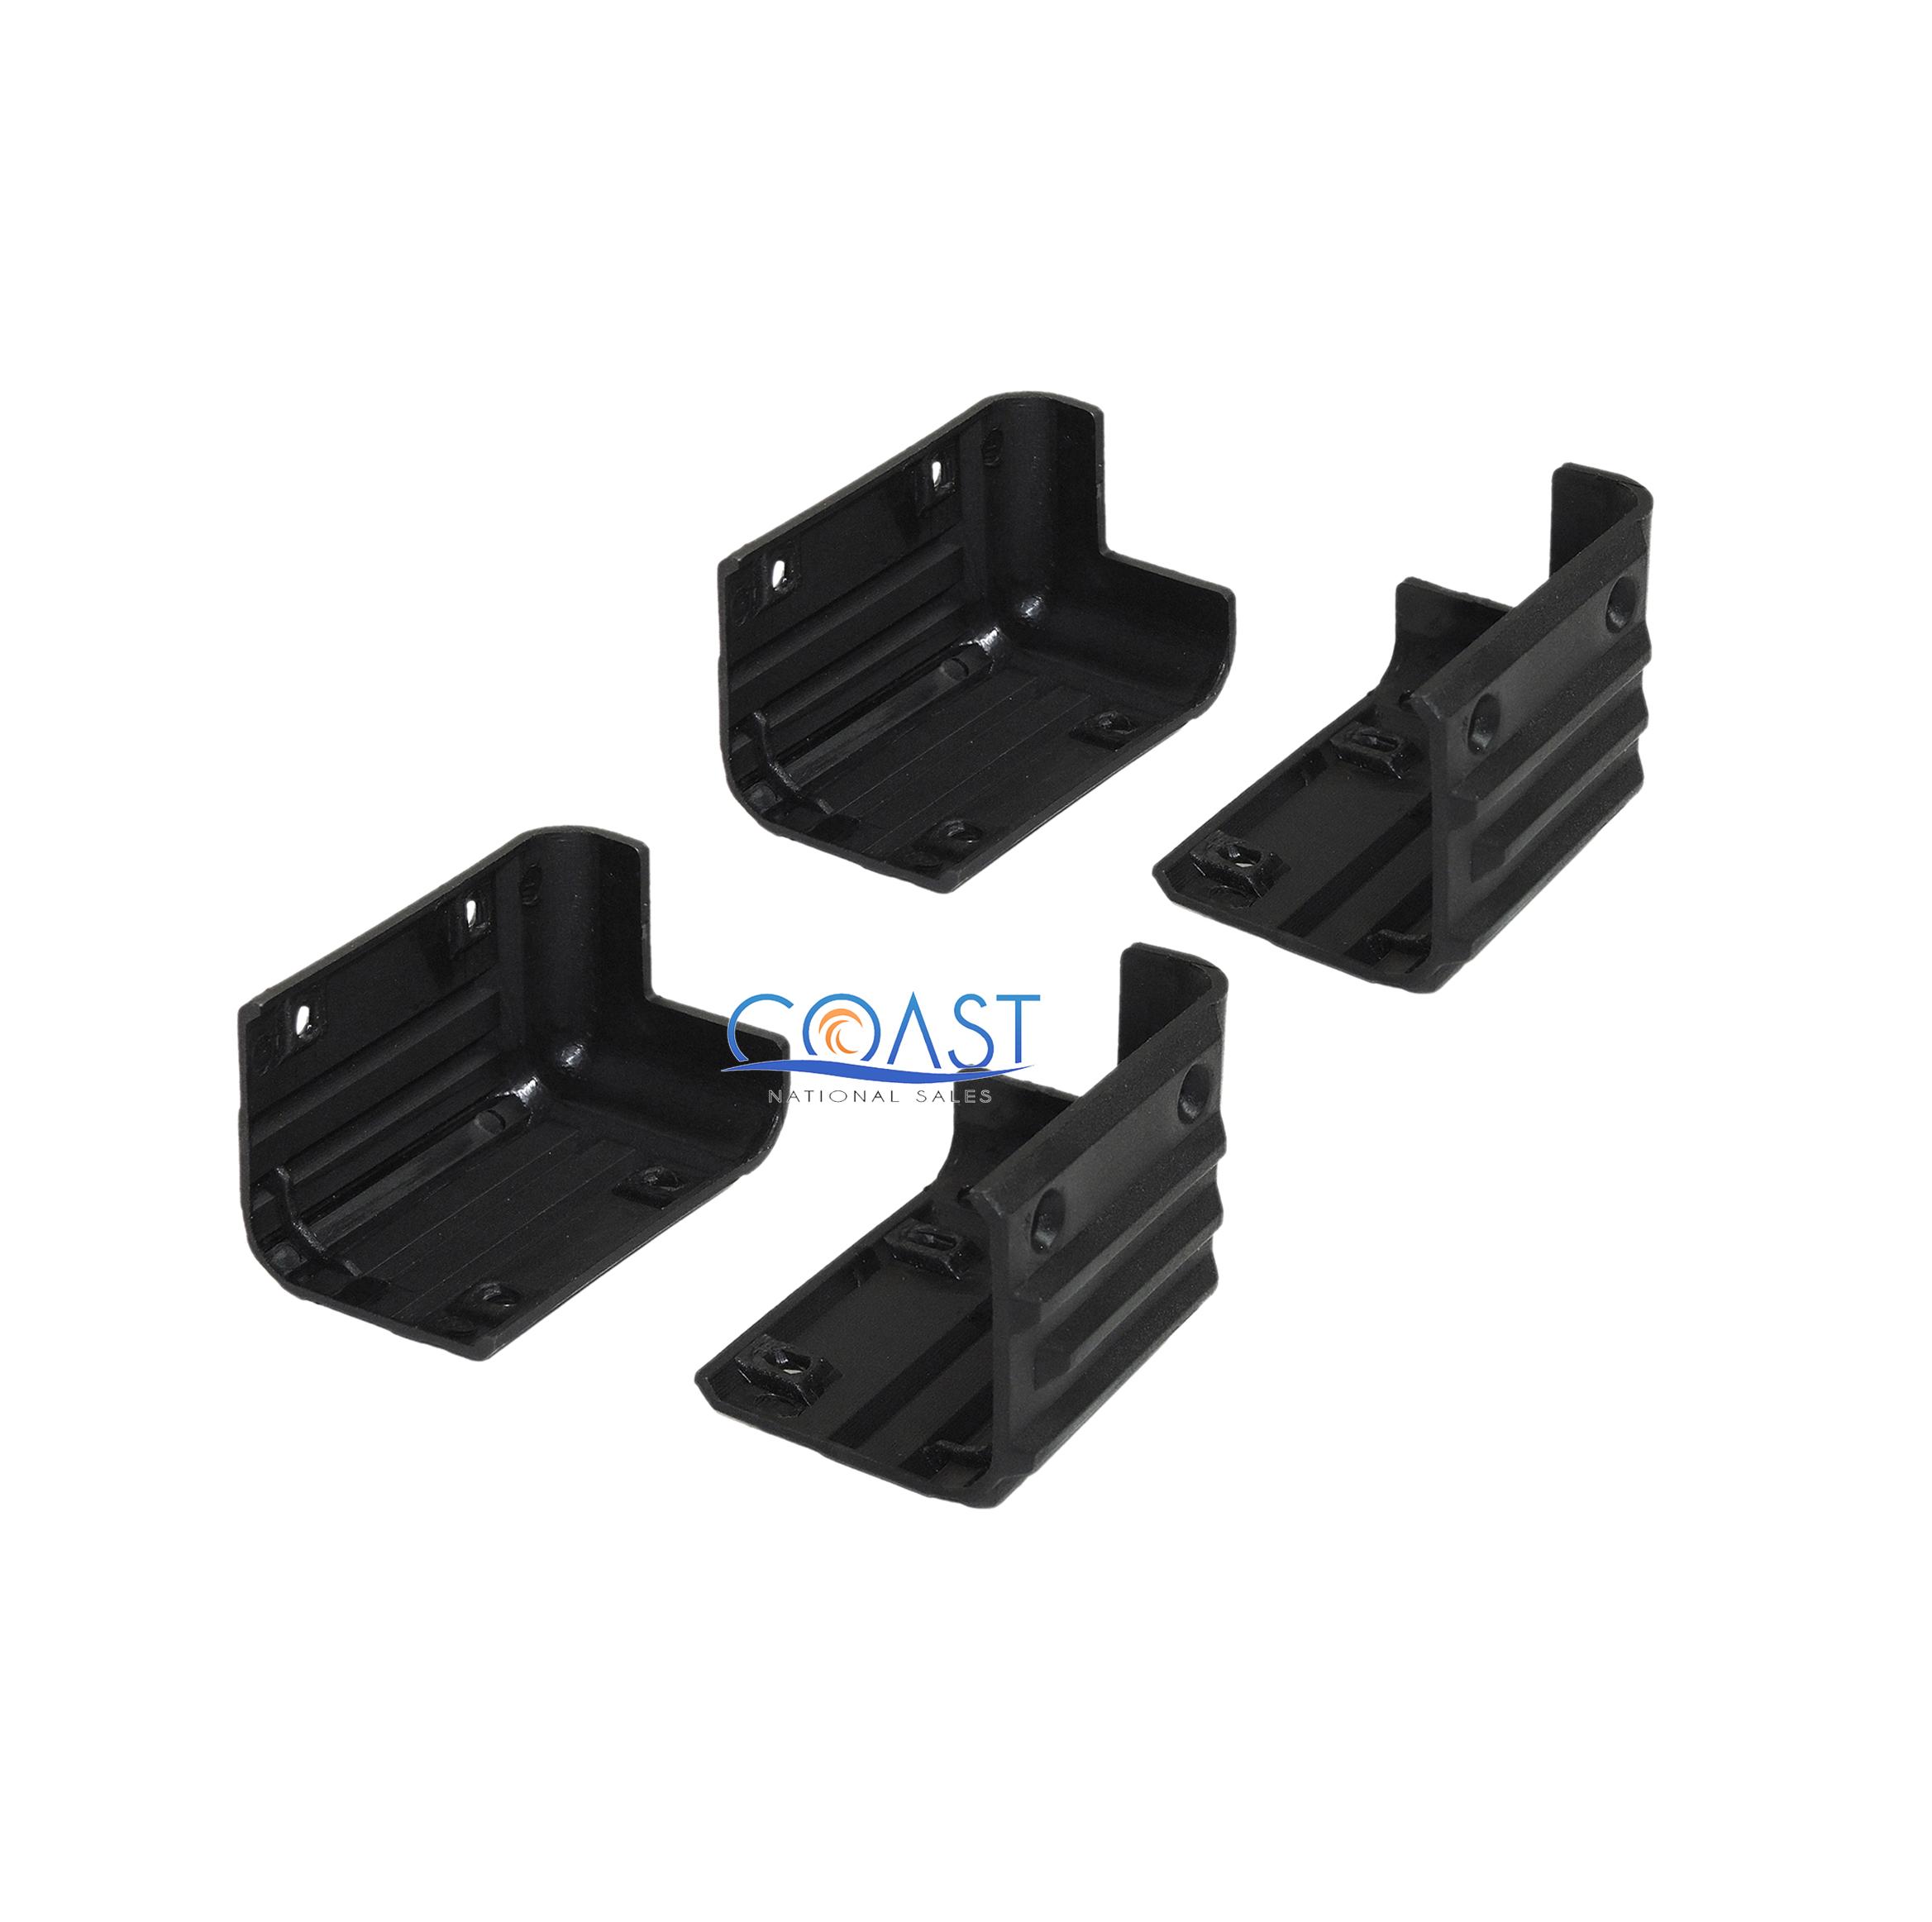 Kitchen Shelf Edge Protectors: Plastic Amp Speaker PA DJ Equipments Corner Cabinet